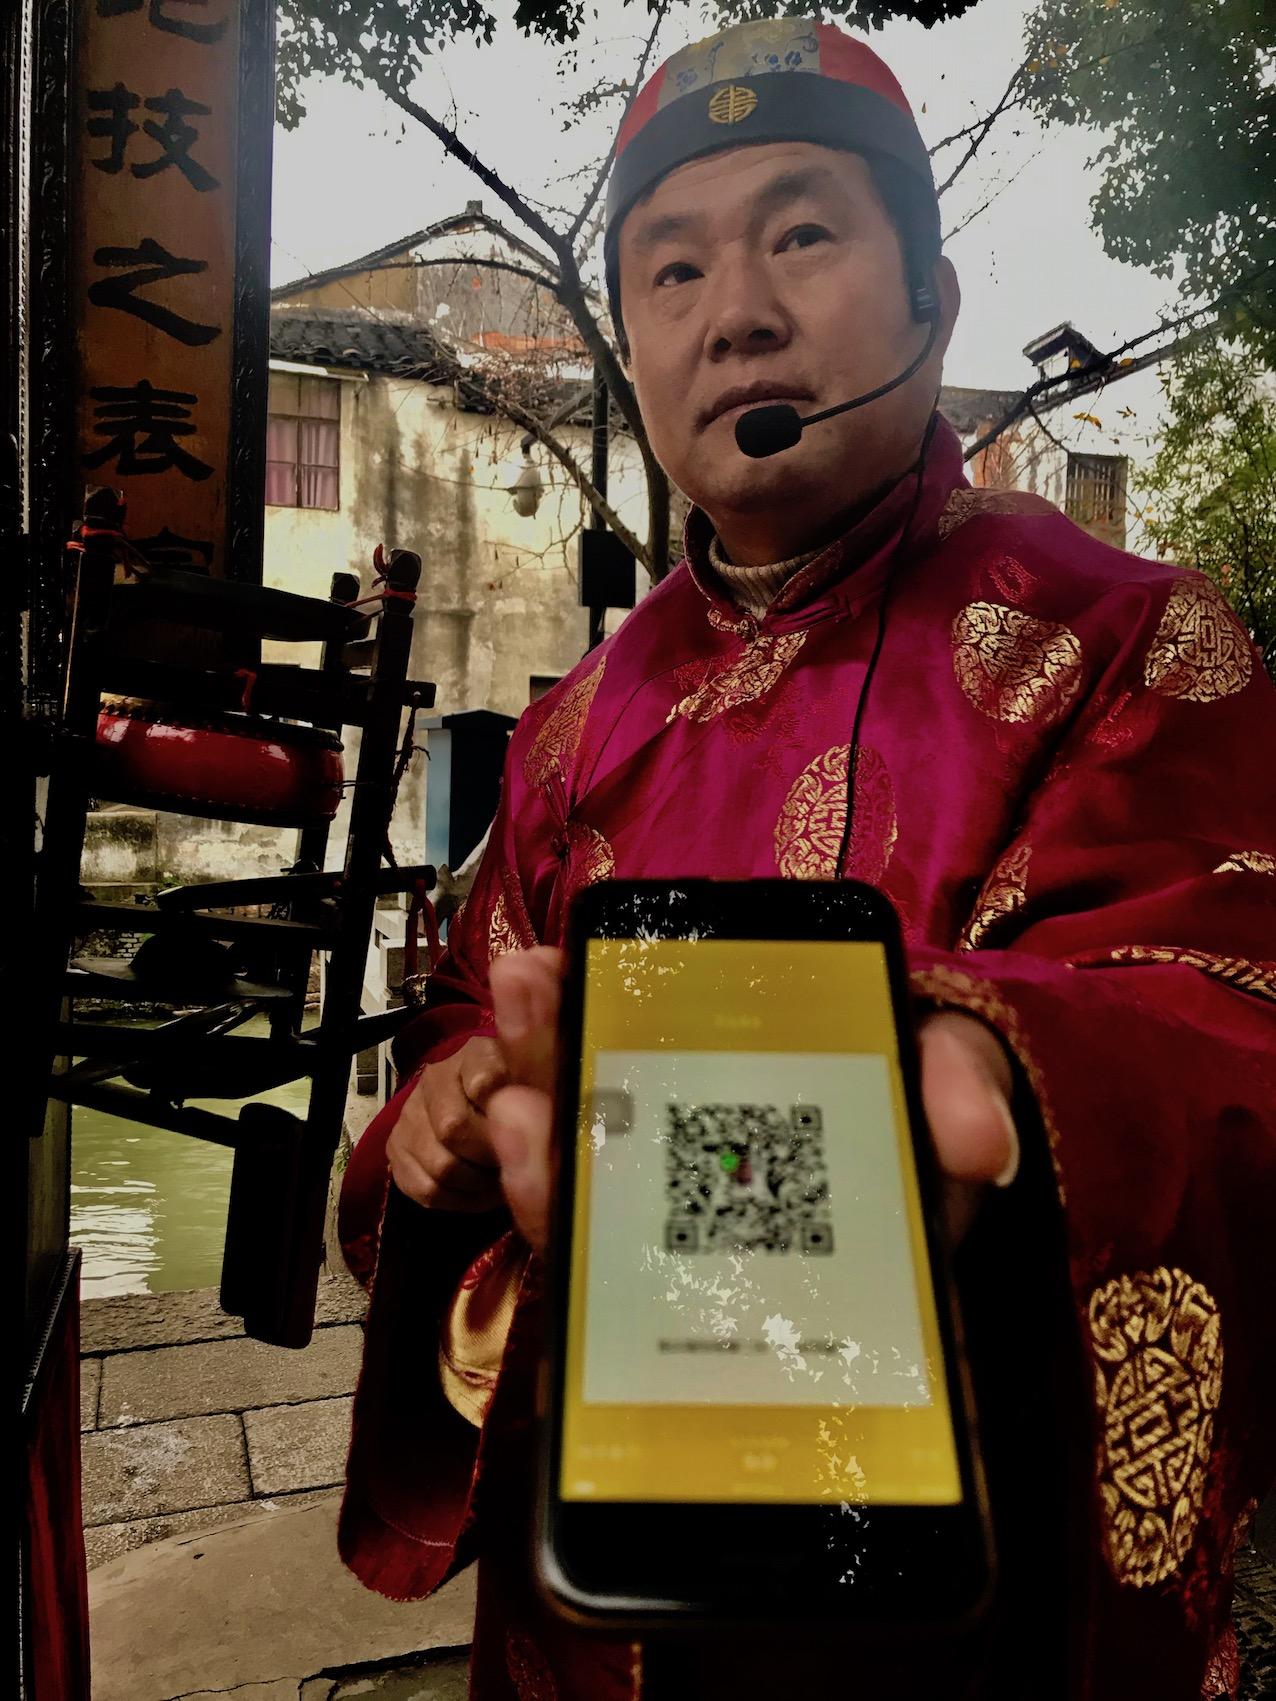 Peep show man Shantang Street Suzhou China